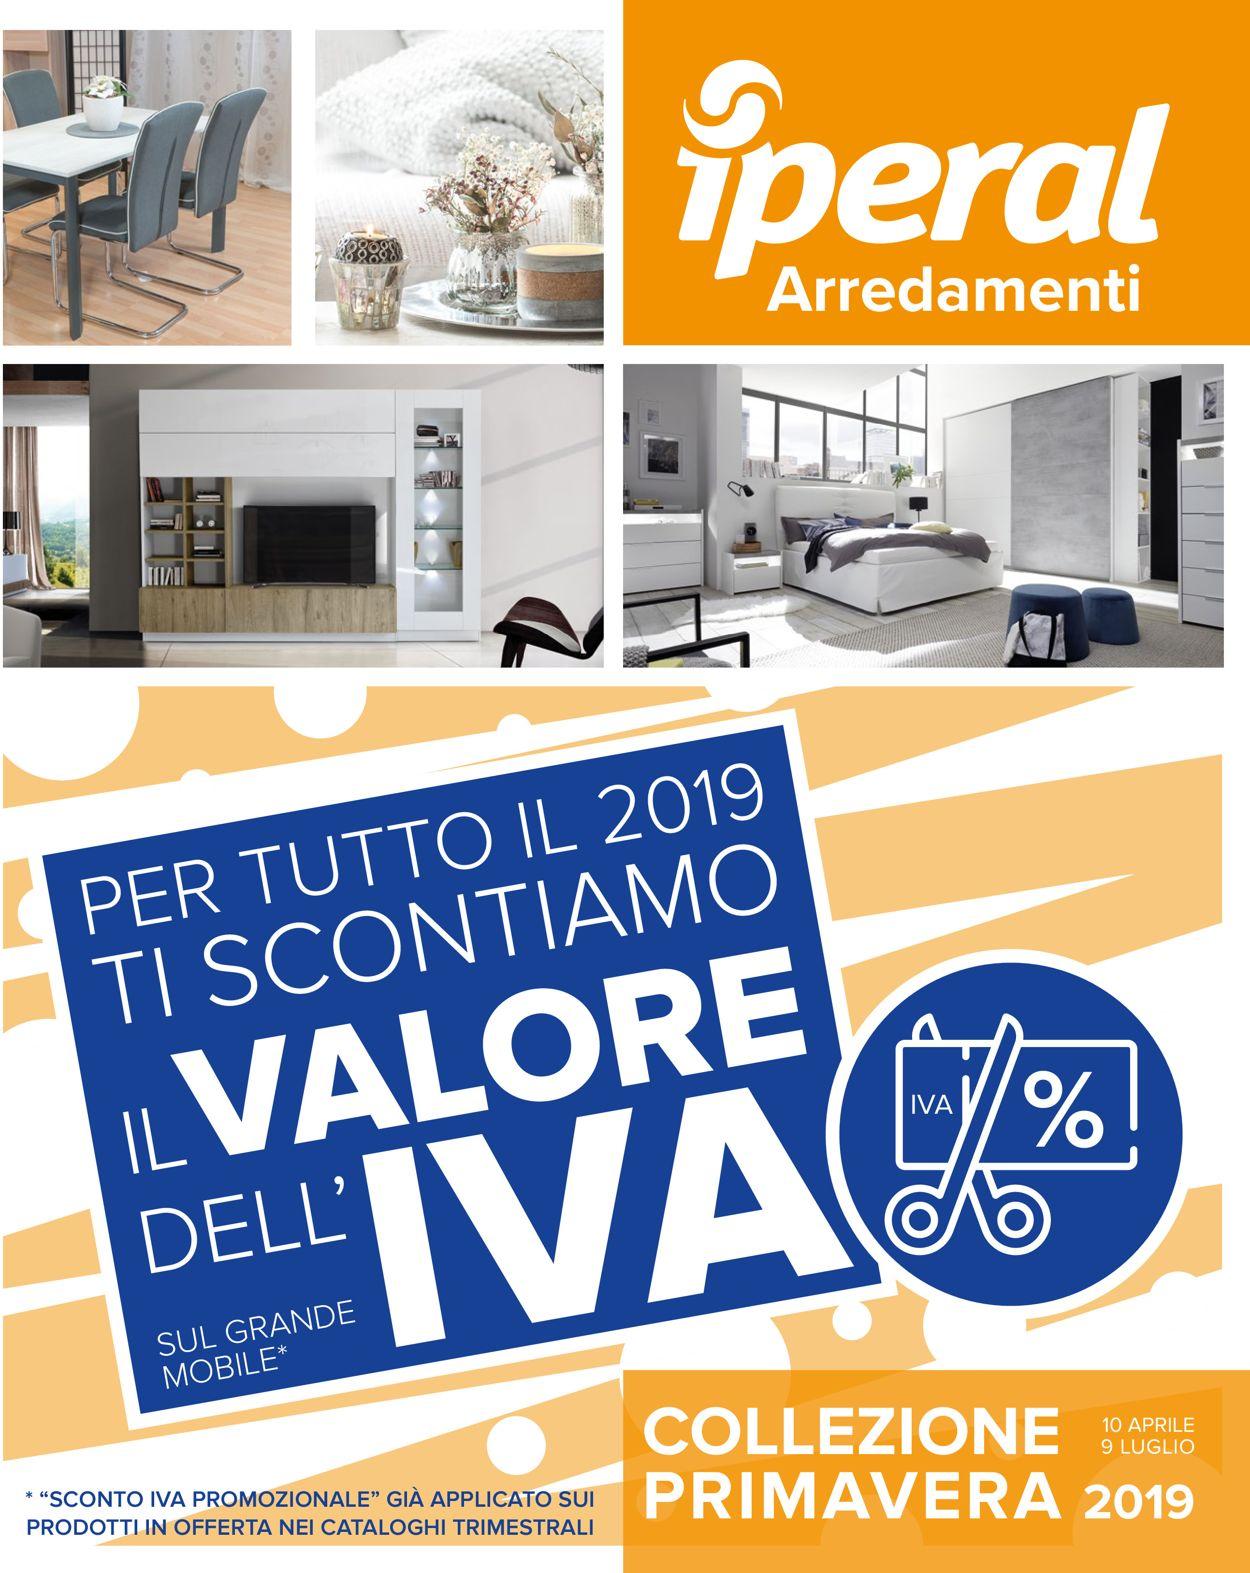 Volantino Iperal - Offerte 10/04-09/07/2019